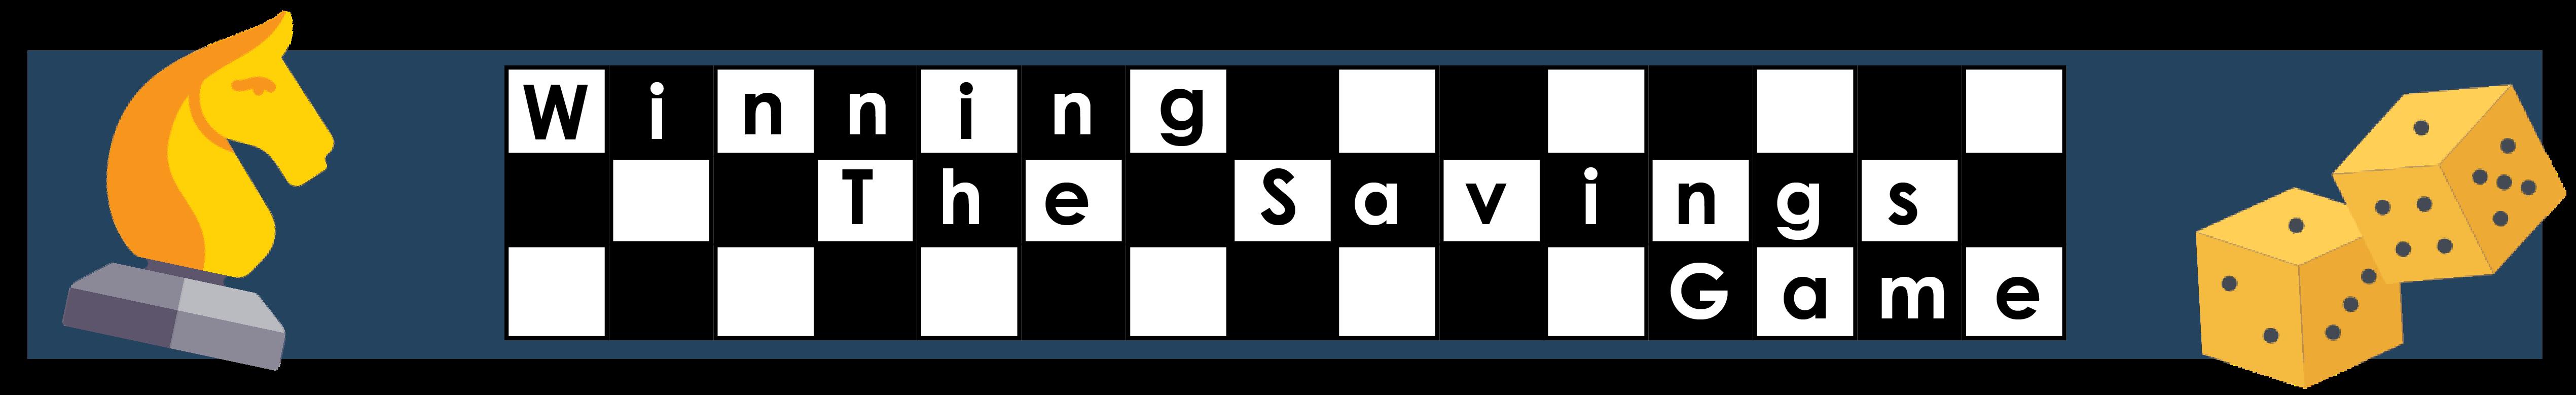 Winning the Savings Game Header.png